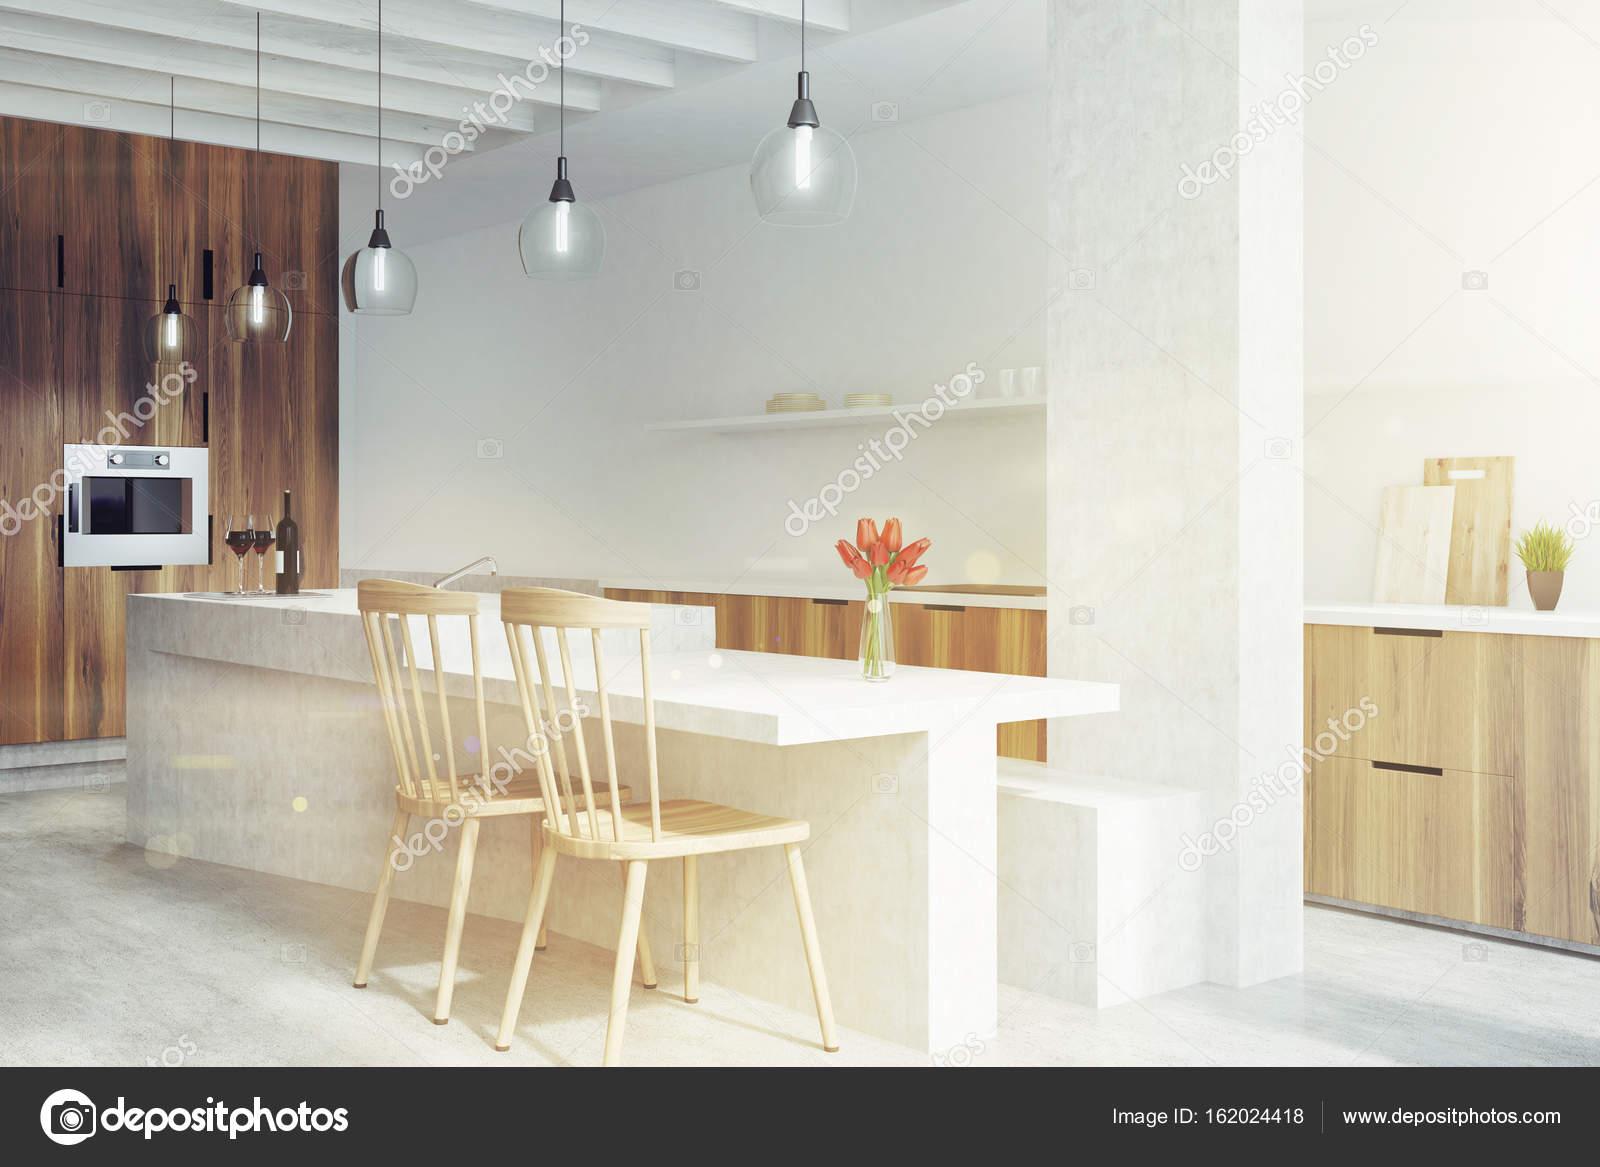 kitchen ovens chicago faucets 大理石酒吧白色的厨房 烤箱定调子 图库照片 c denisismagilov 162024418